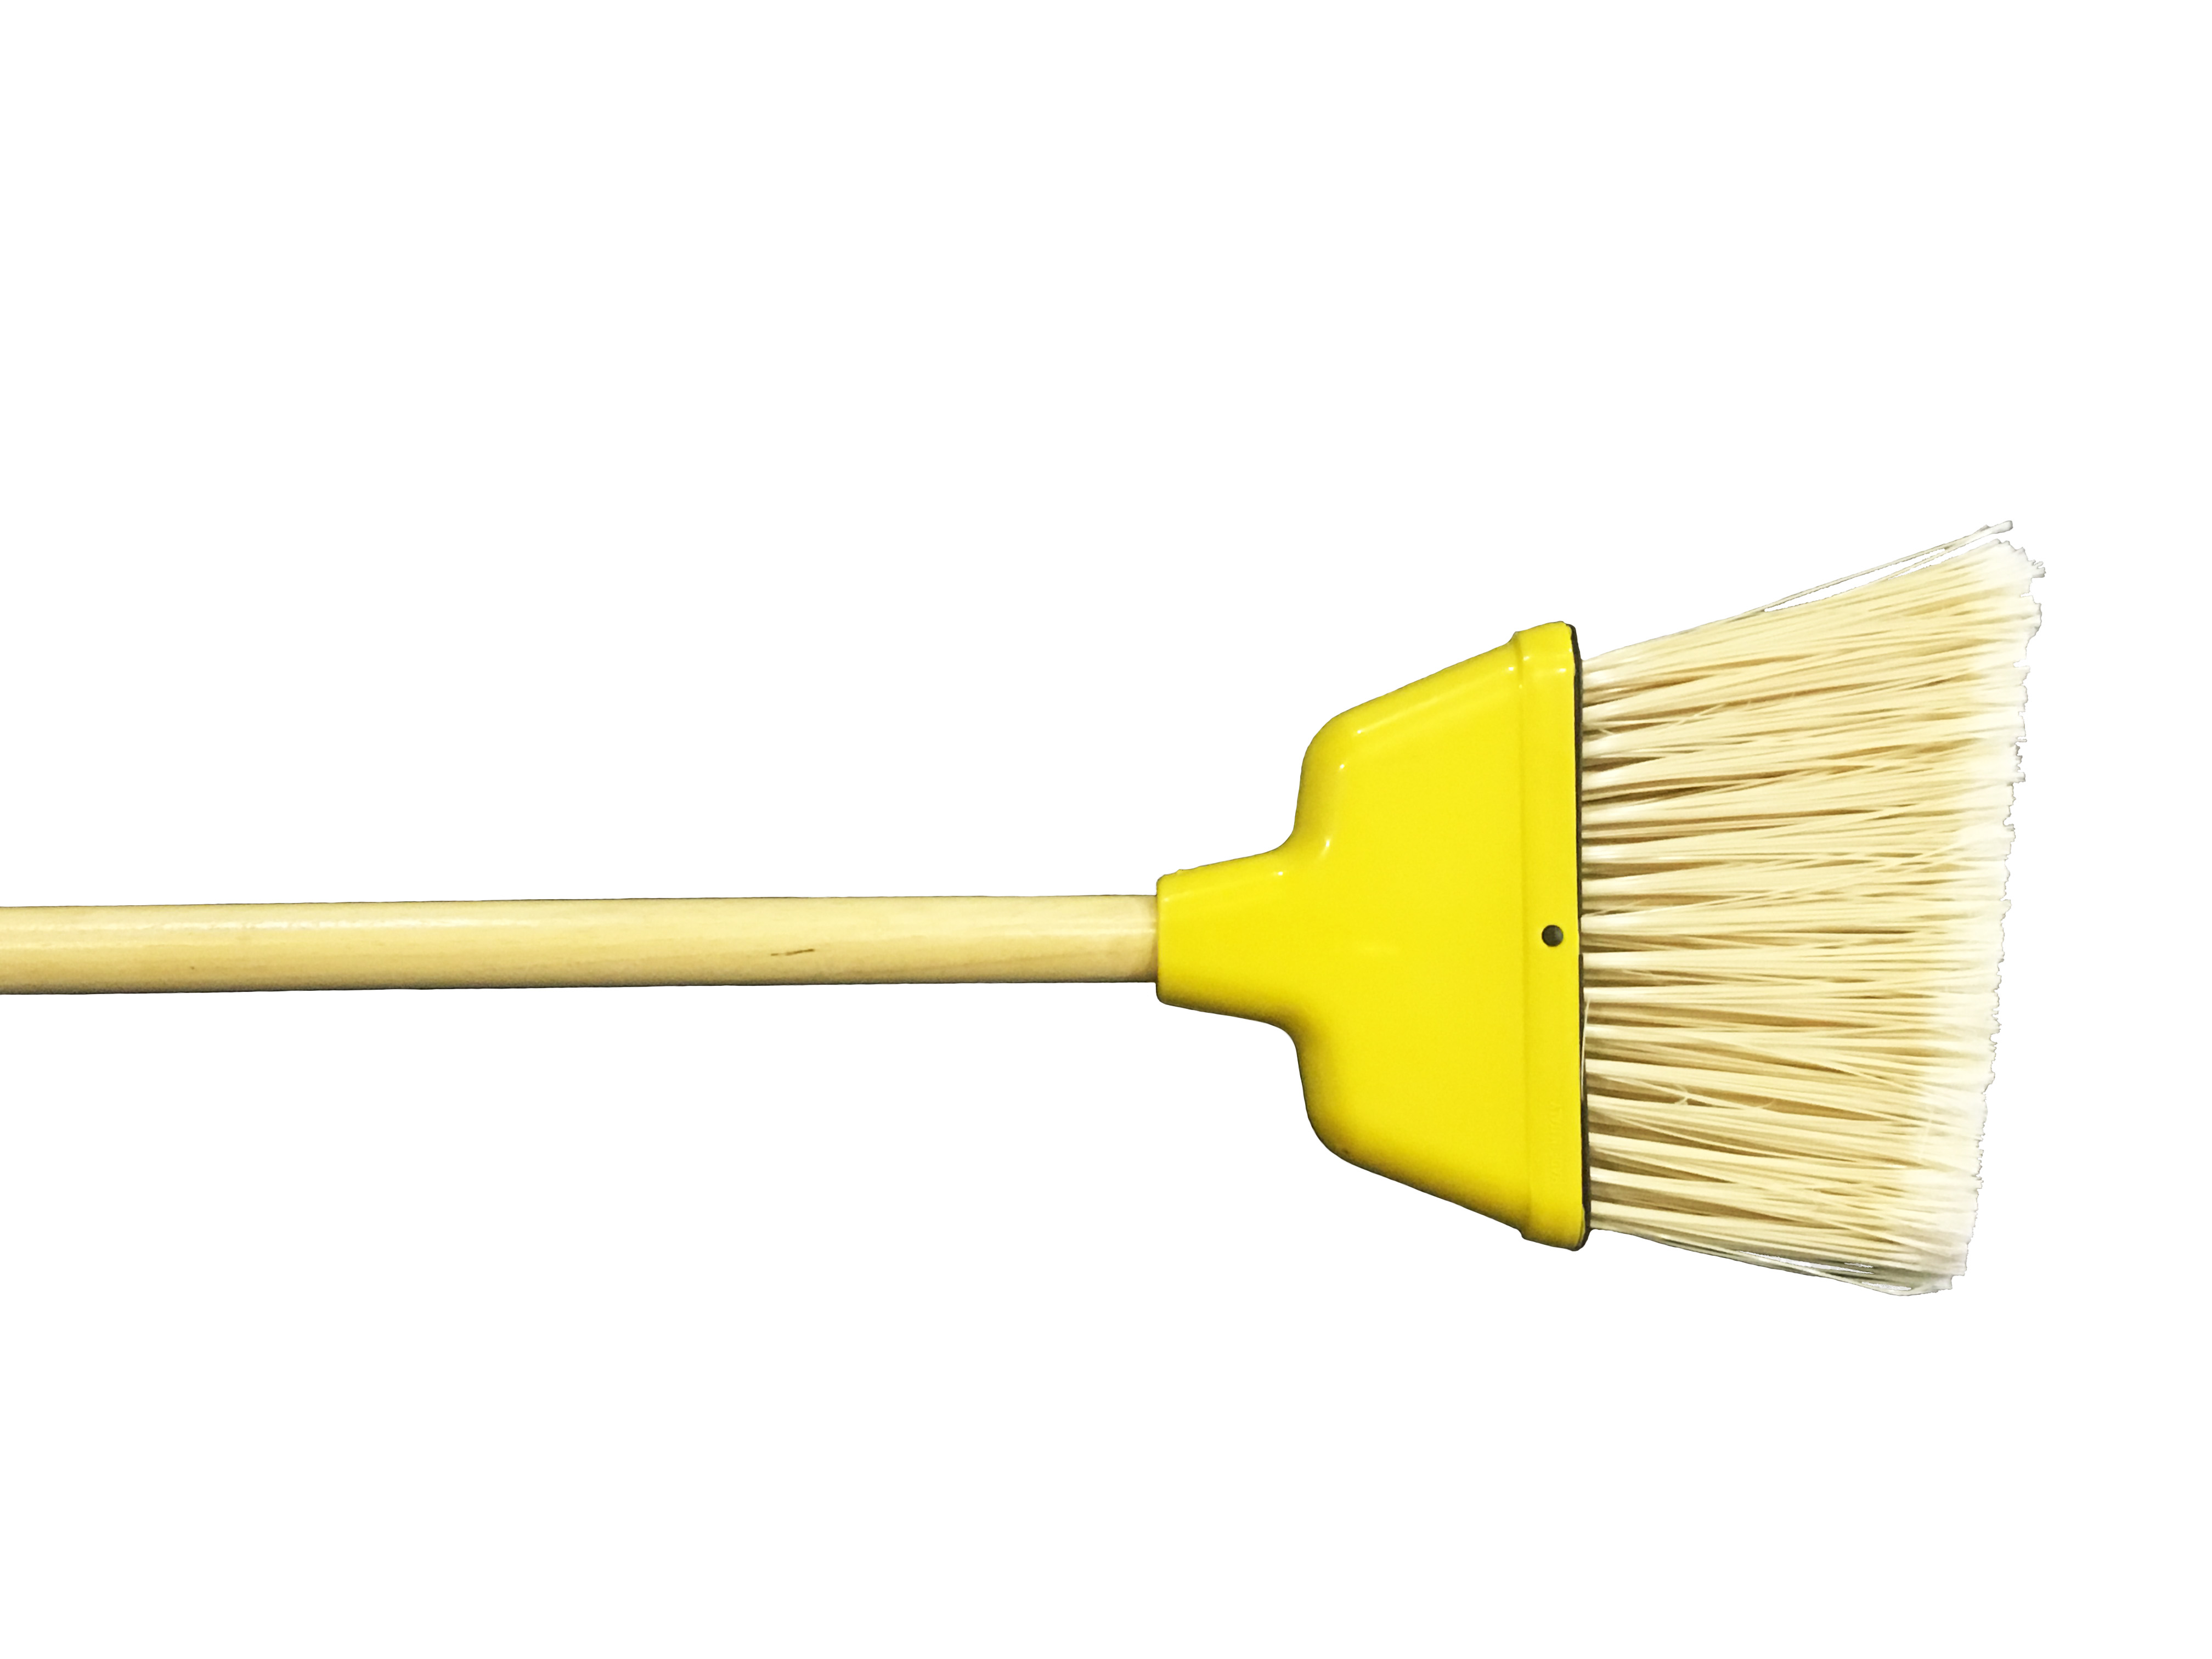 It is a broom